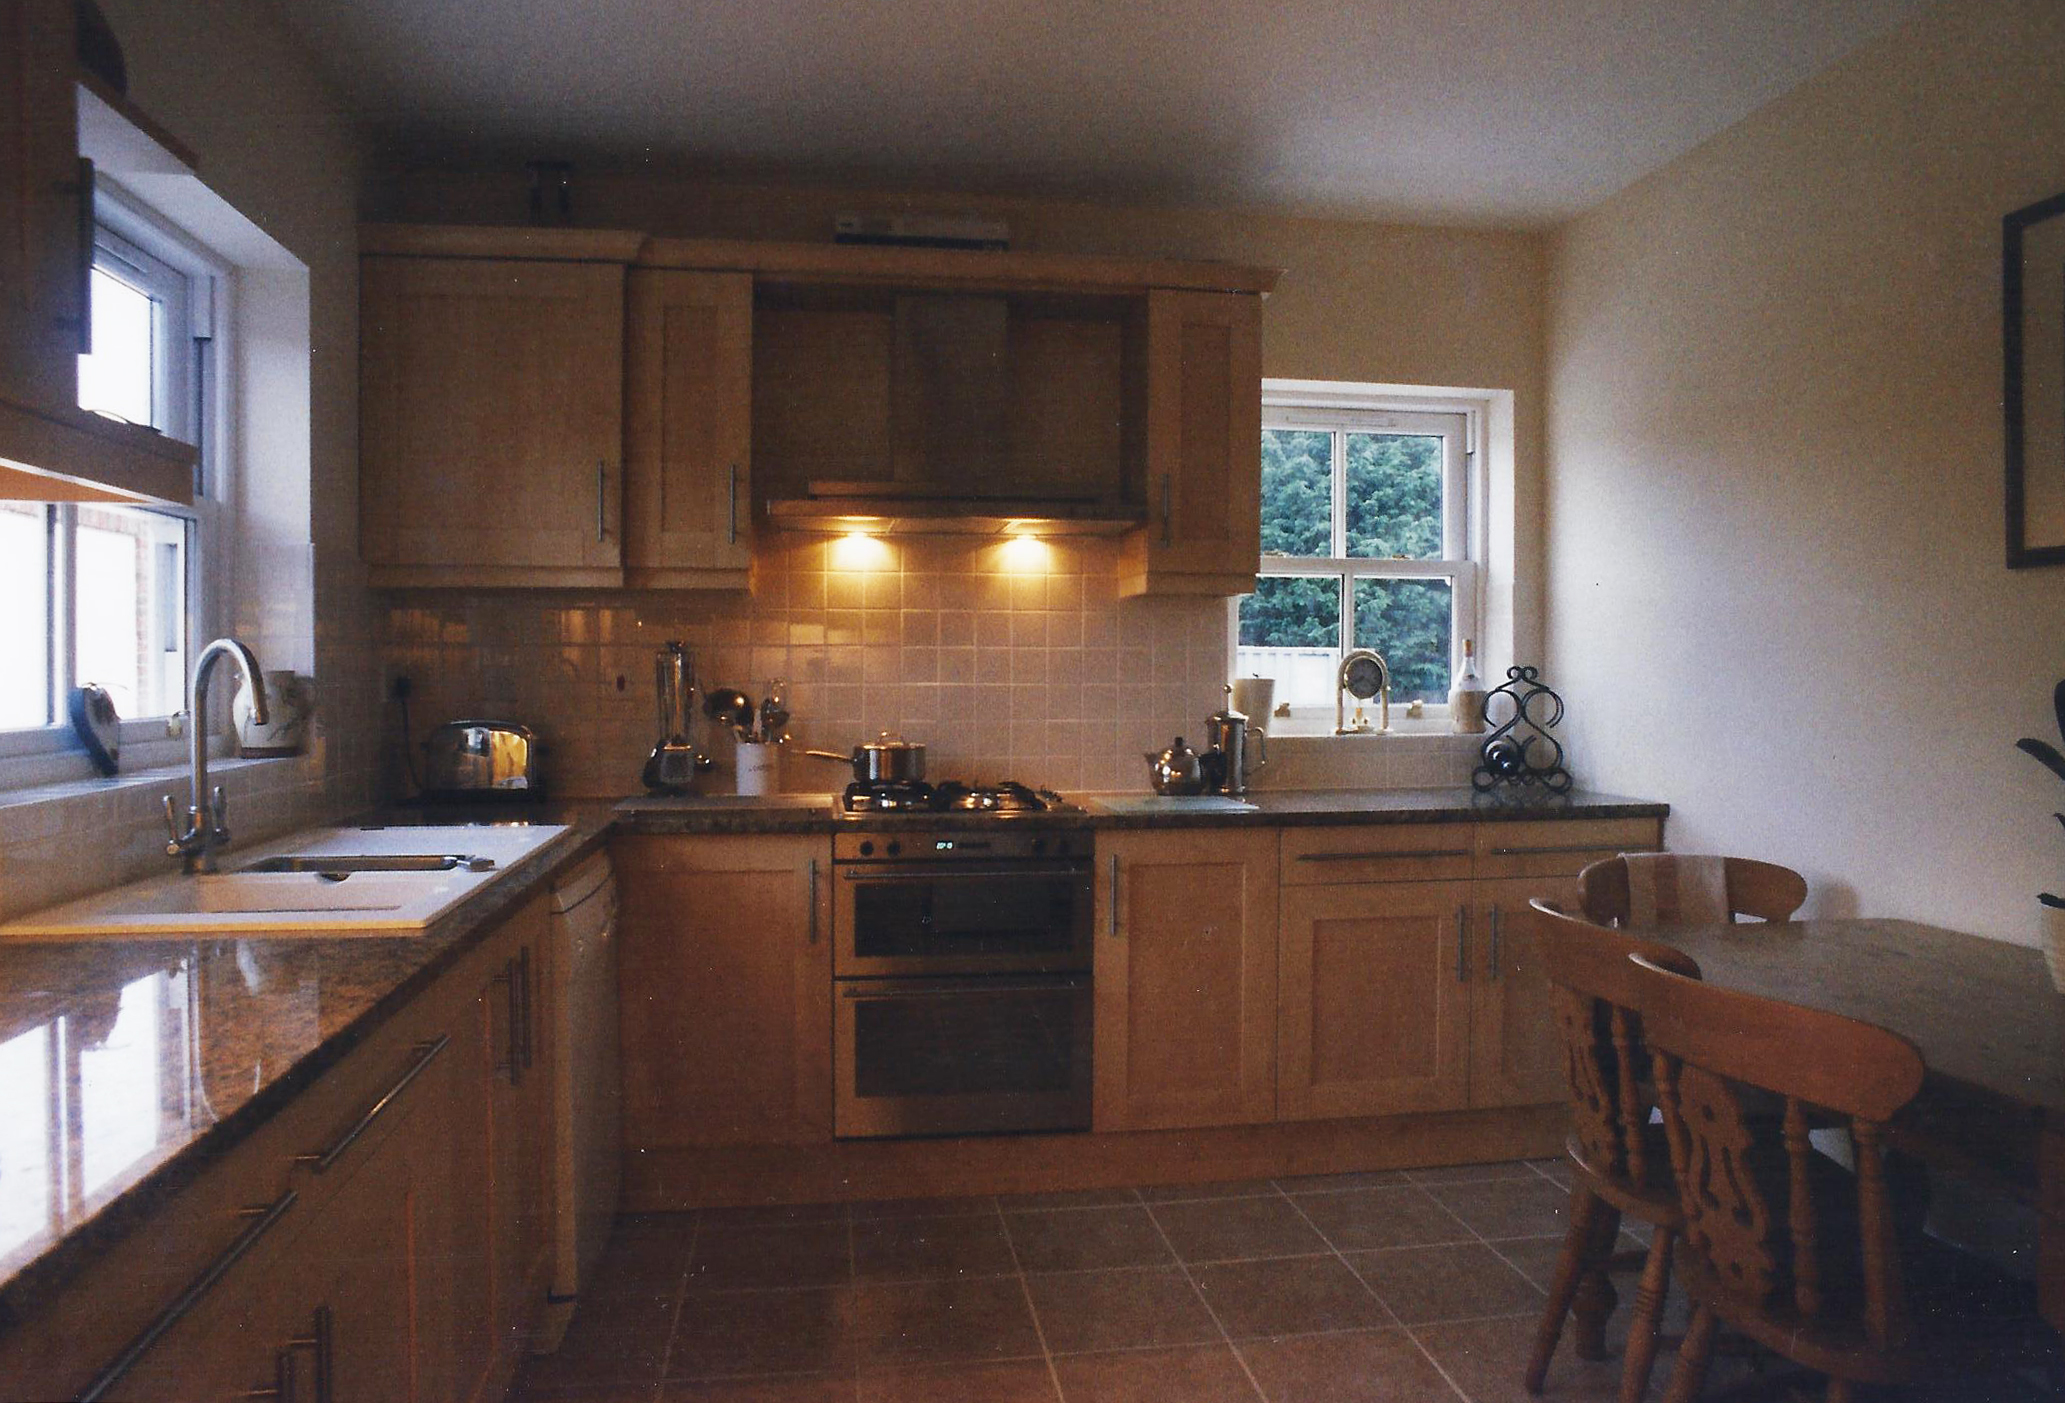 Blenheim Cottage 6 - East Yorkshire Architects - Samuel Kendall Associates.jpg